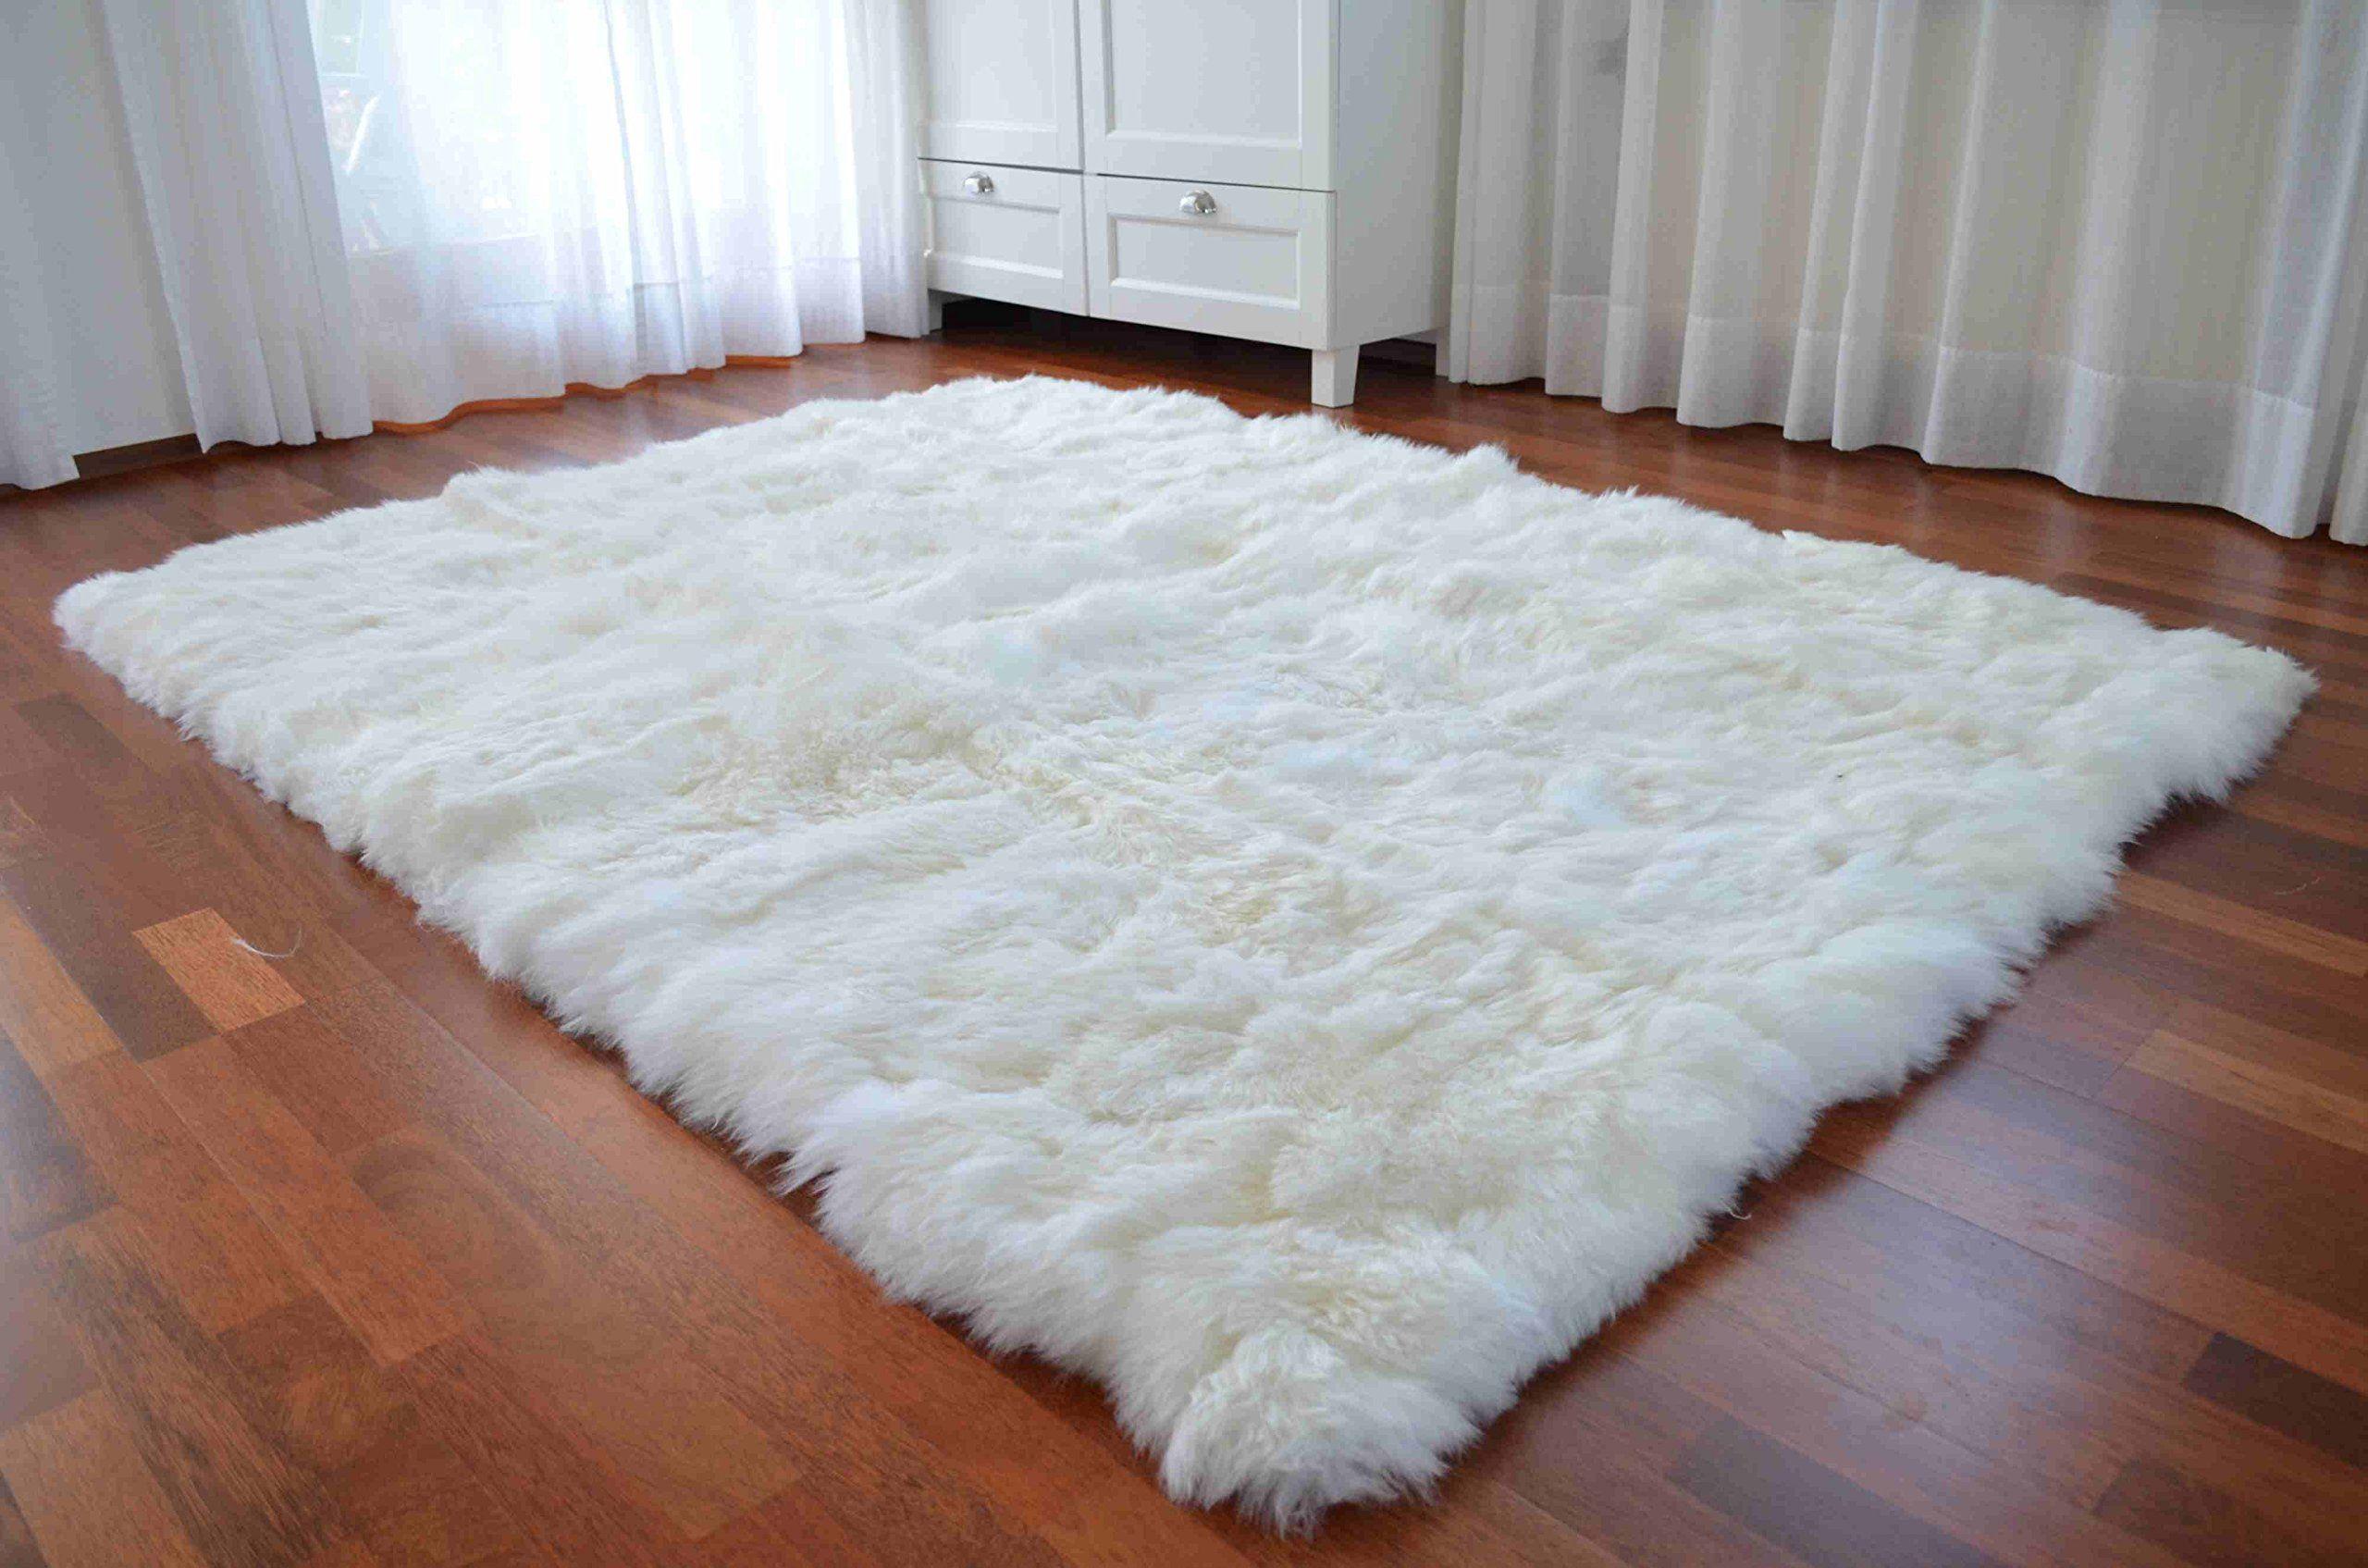 270 euro absoluter traumteppich aber so teuer design ko schaffell teppich 150 x 200. Black Bedroom Furniture Sets. Home Design Ideas